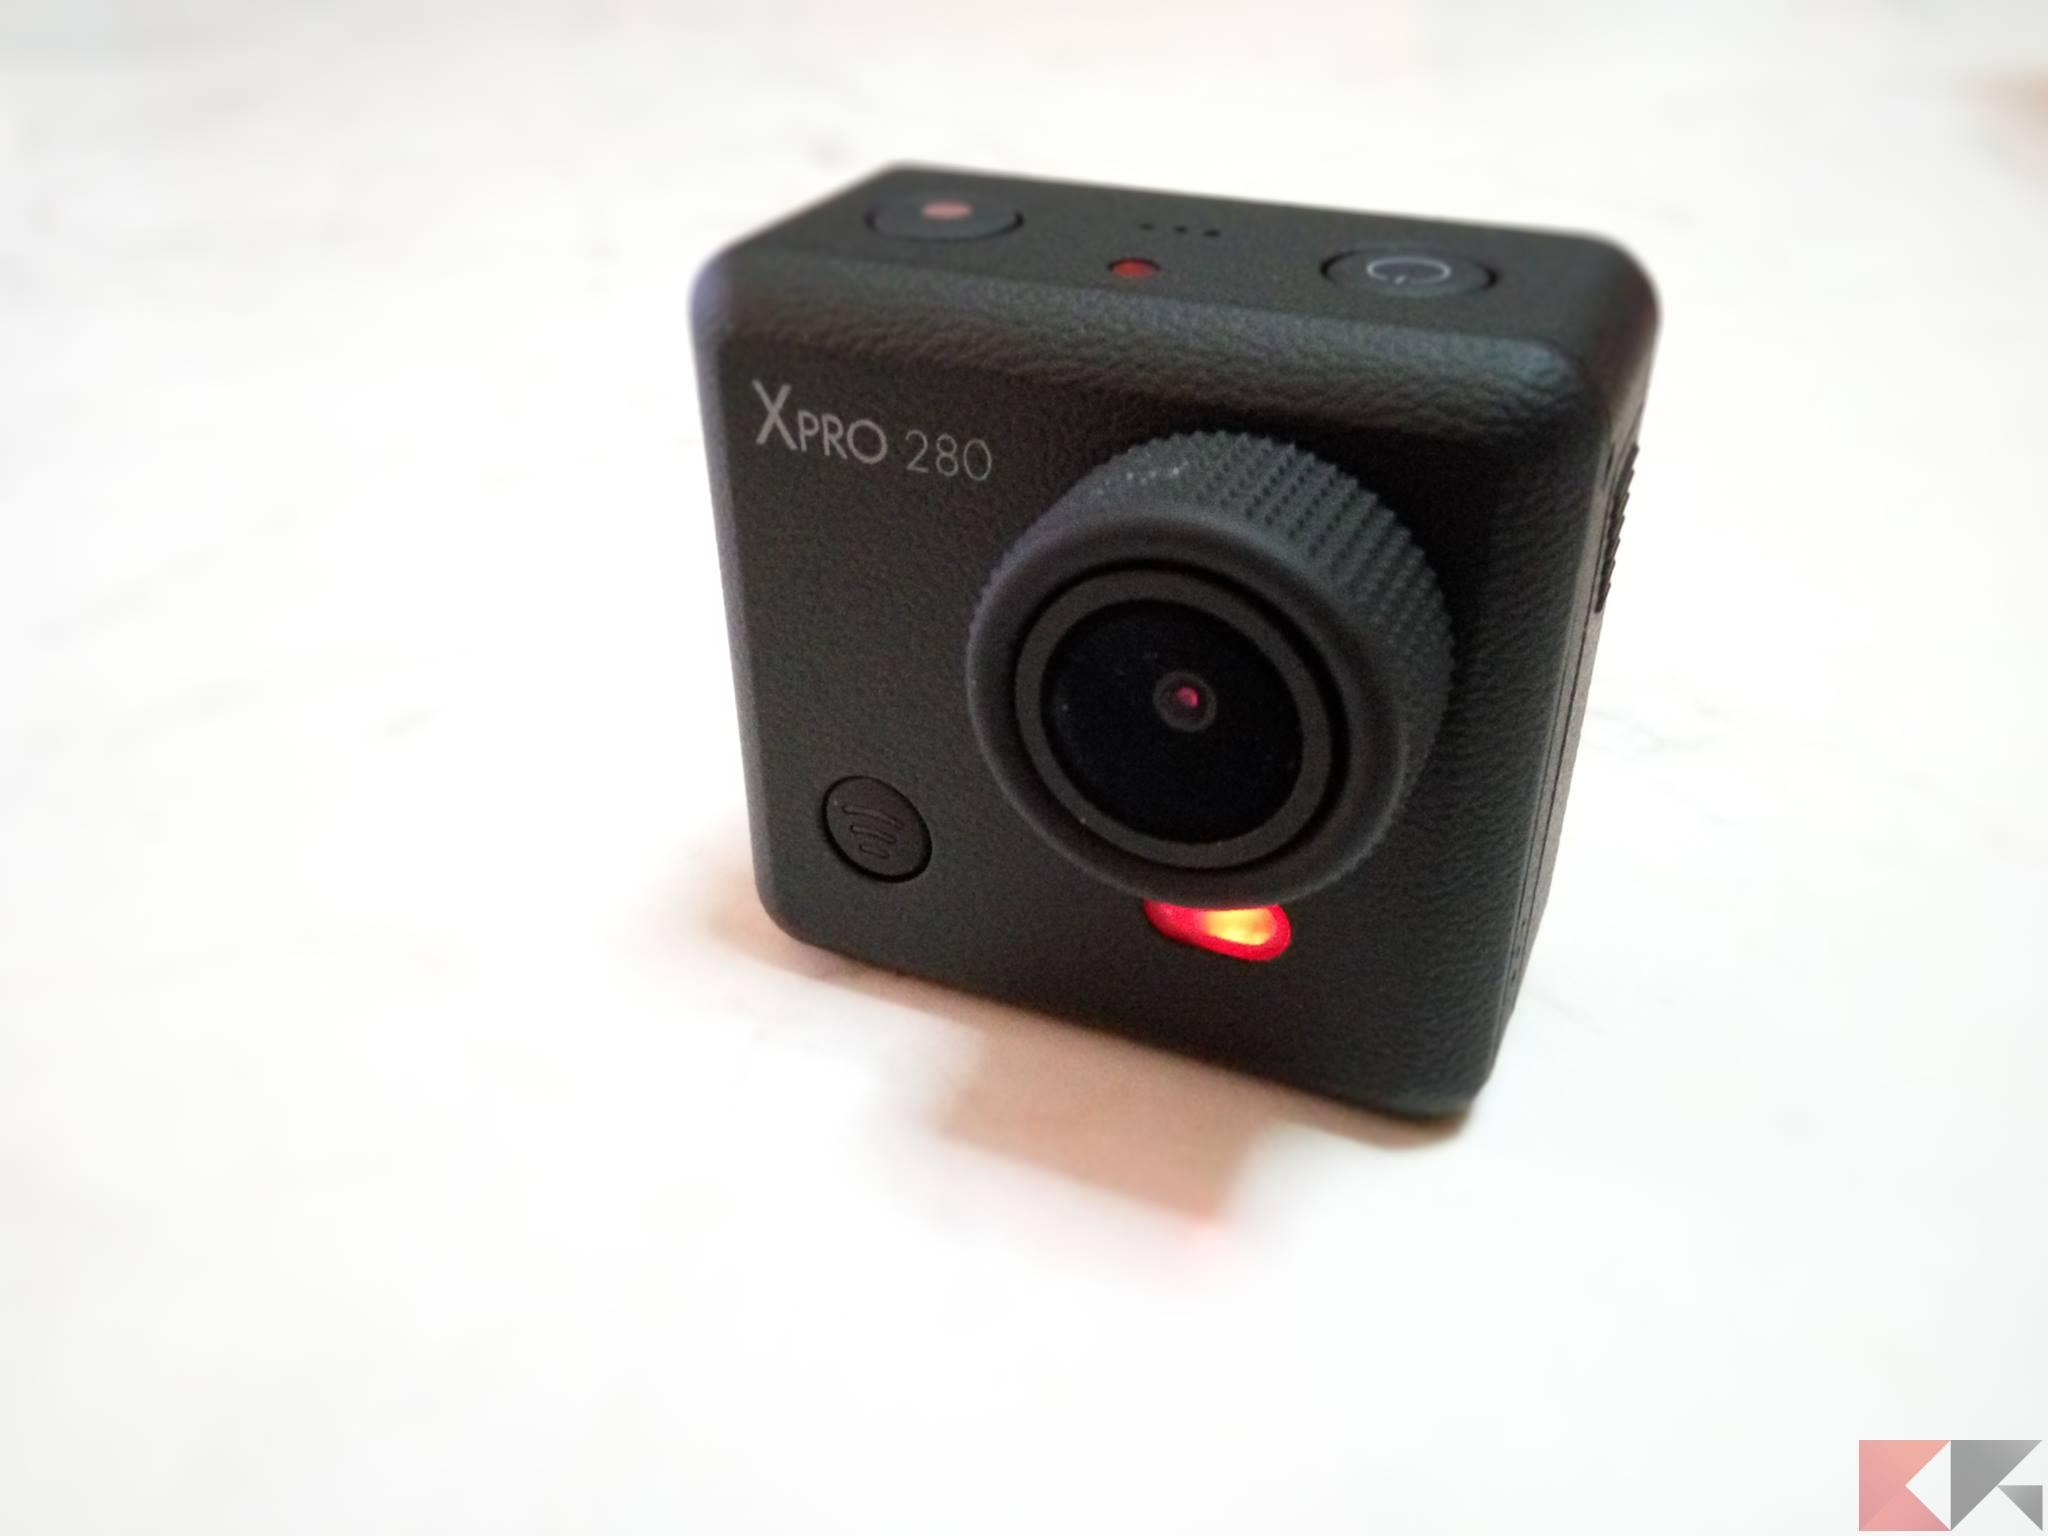 MEDIACOM SportCam Xpro 280 HD WiFi